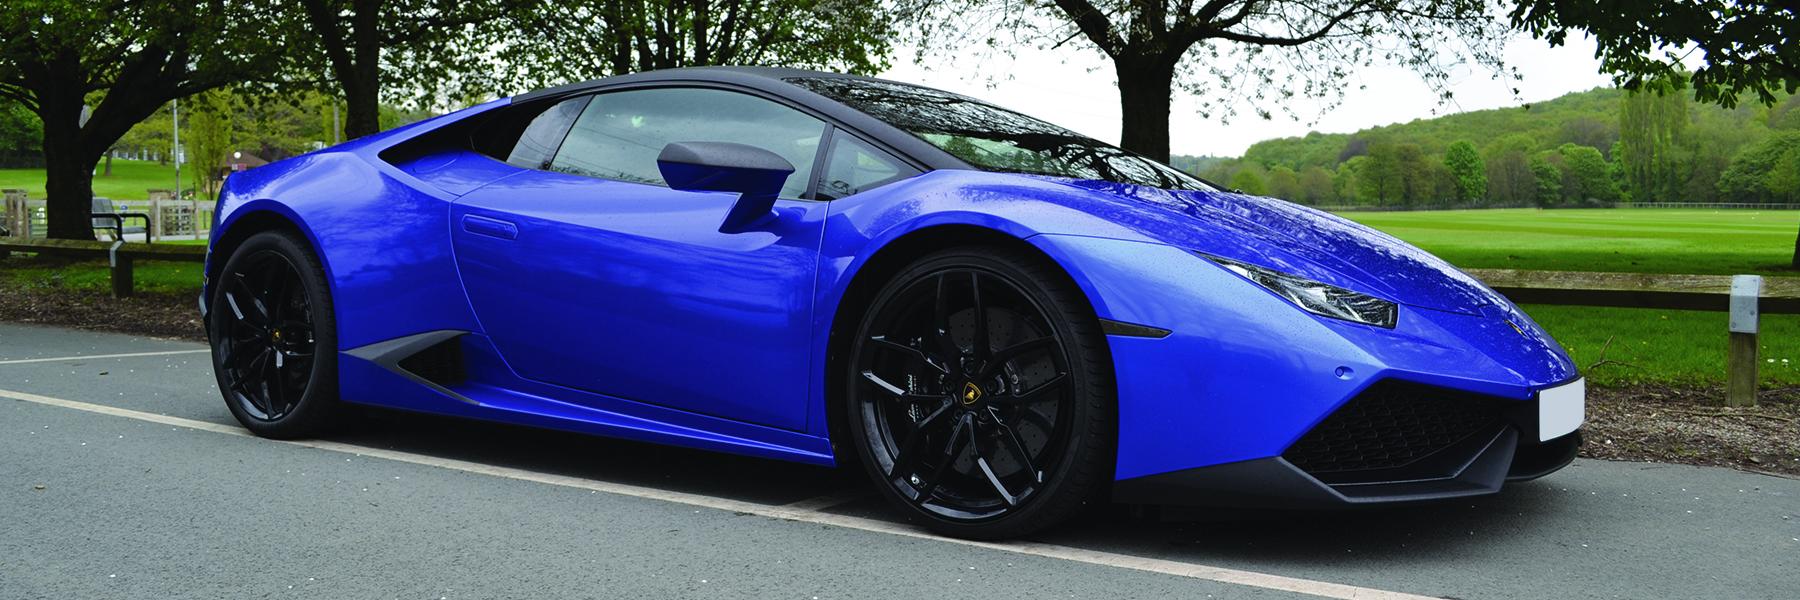 Lamborghini Huracan Cosmic Blue Homepage Banner